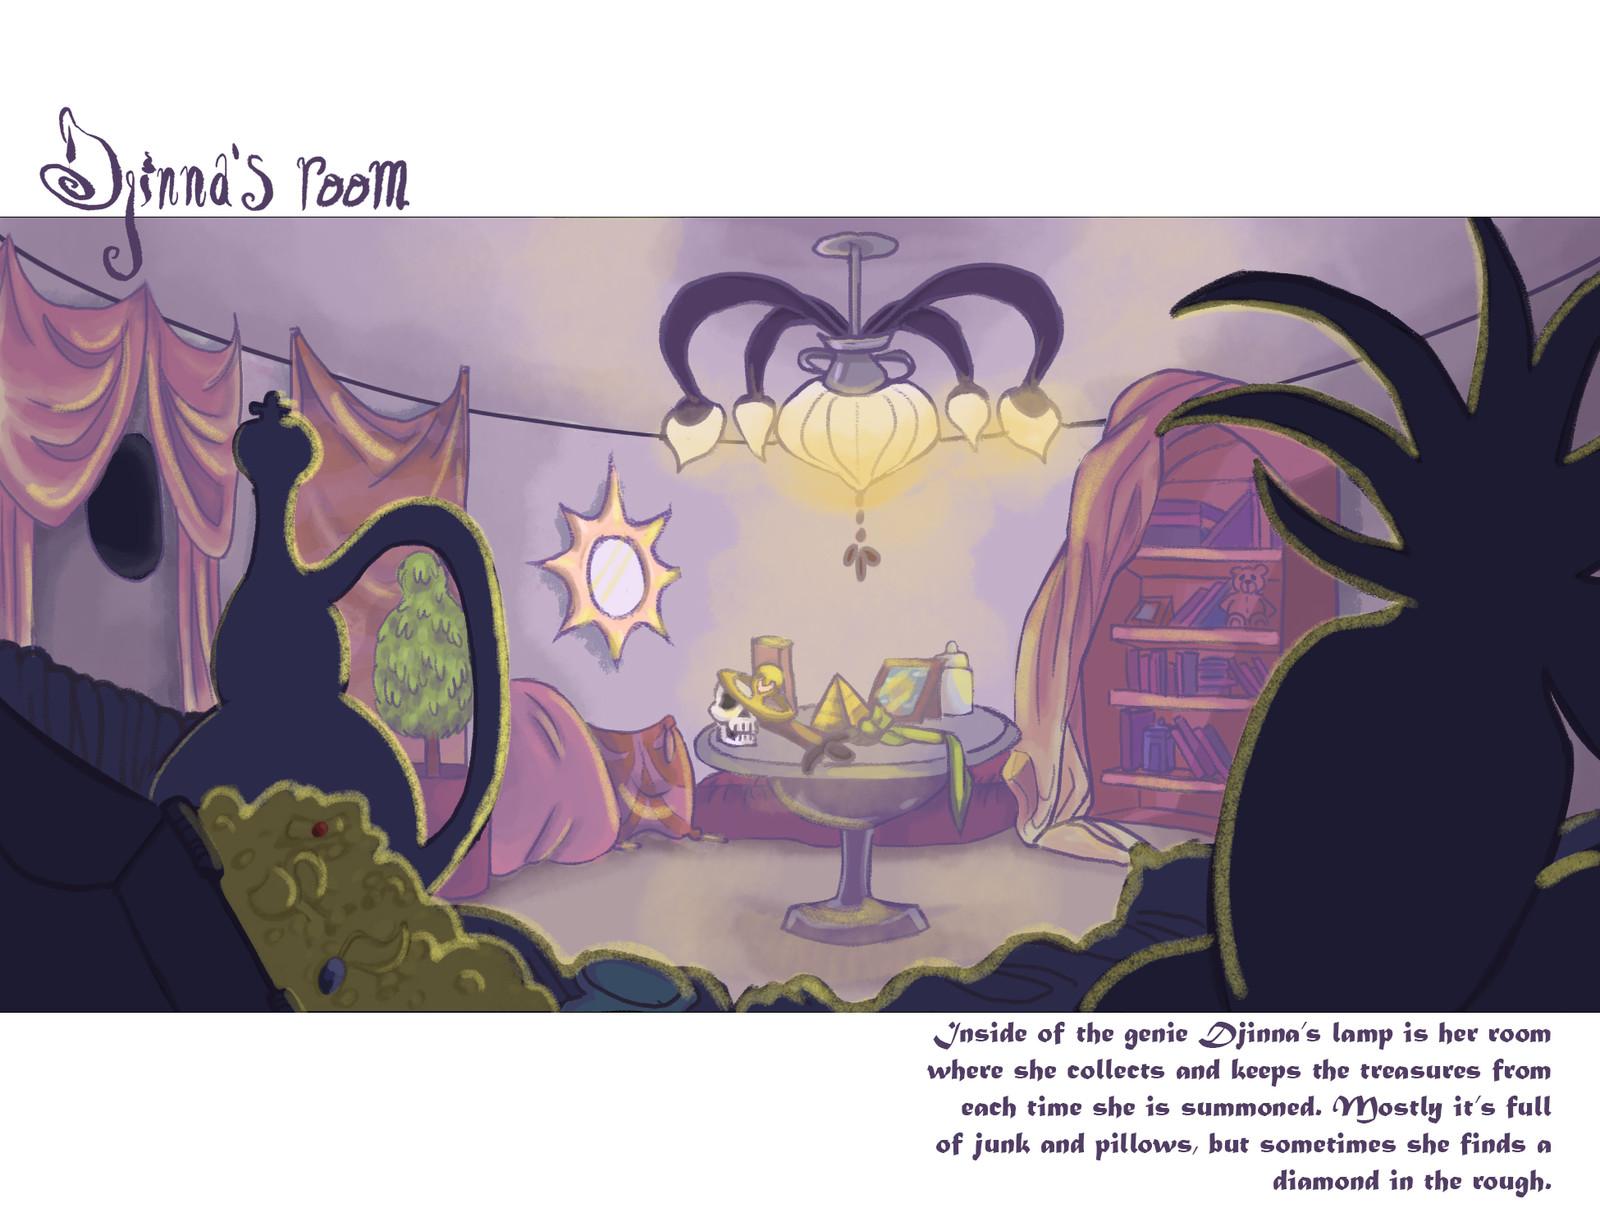 Inside Djinna's, a genie, lamp is her room.